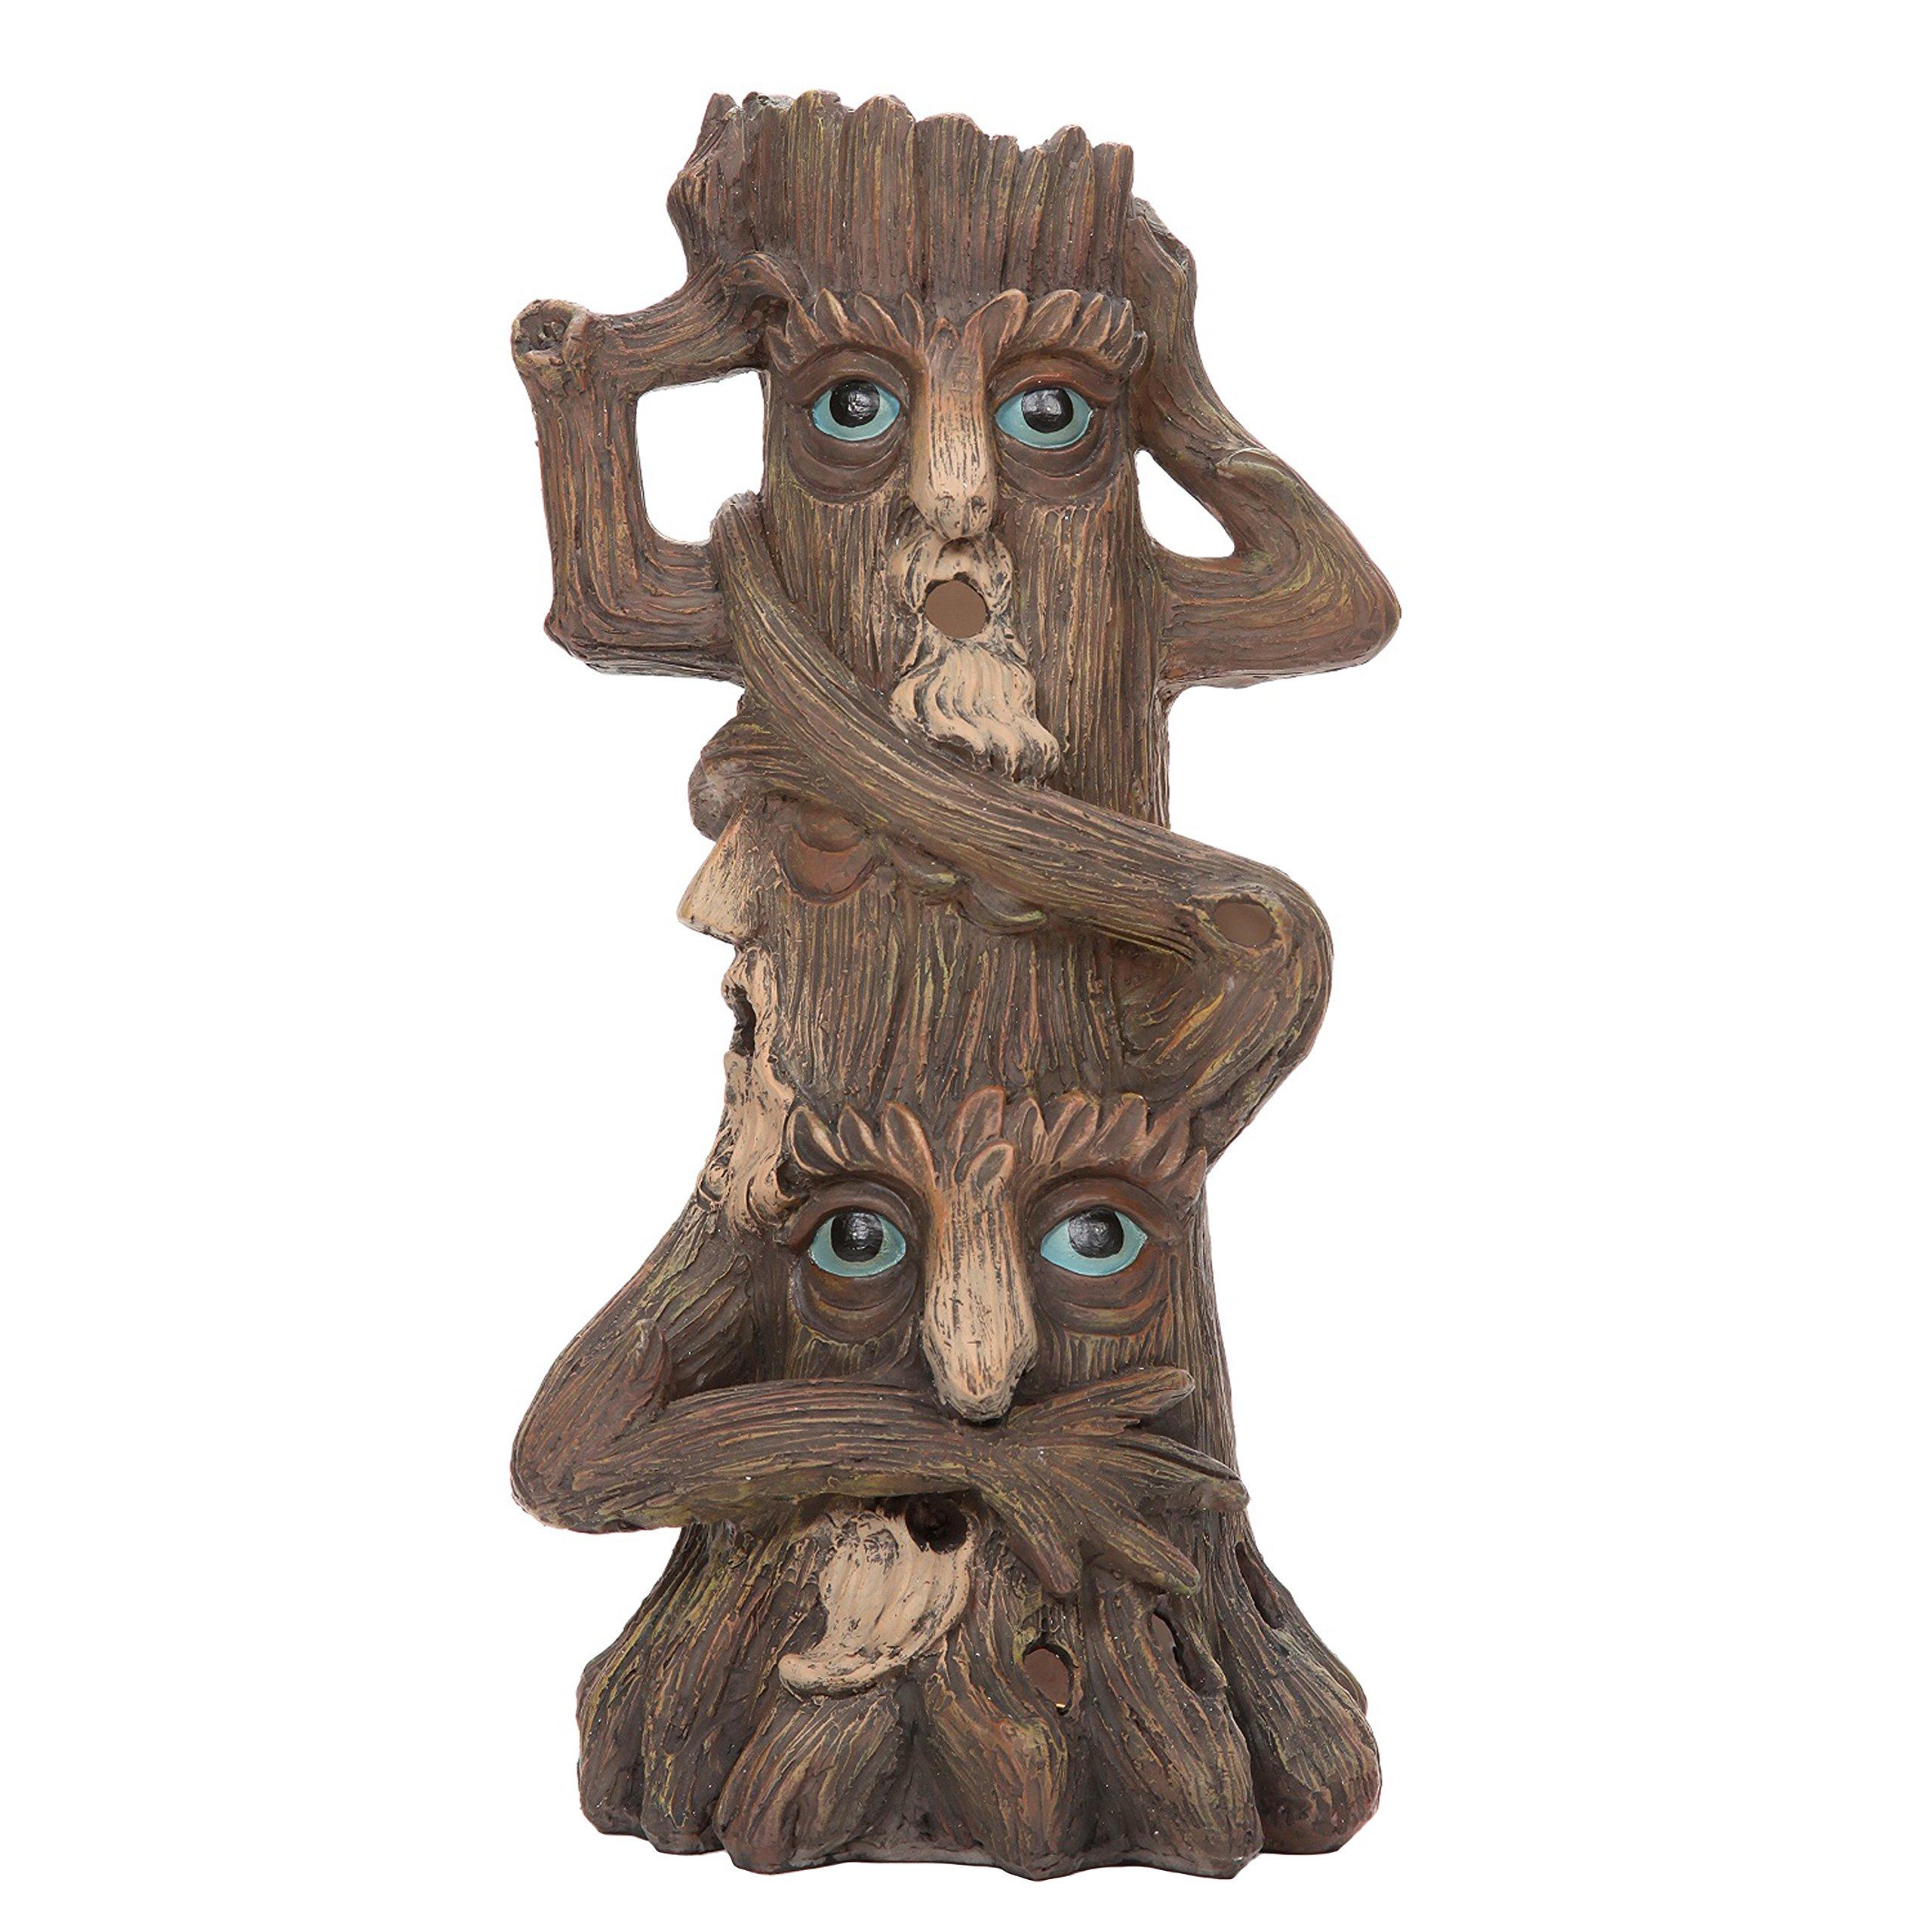 Hosley 12'' High Tree Man Incense Holder. Ideal for Aromatherapy, Zen, Spa, Vastu, Reiki Chakra Settings. P1